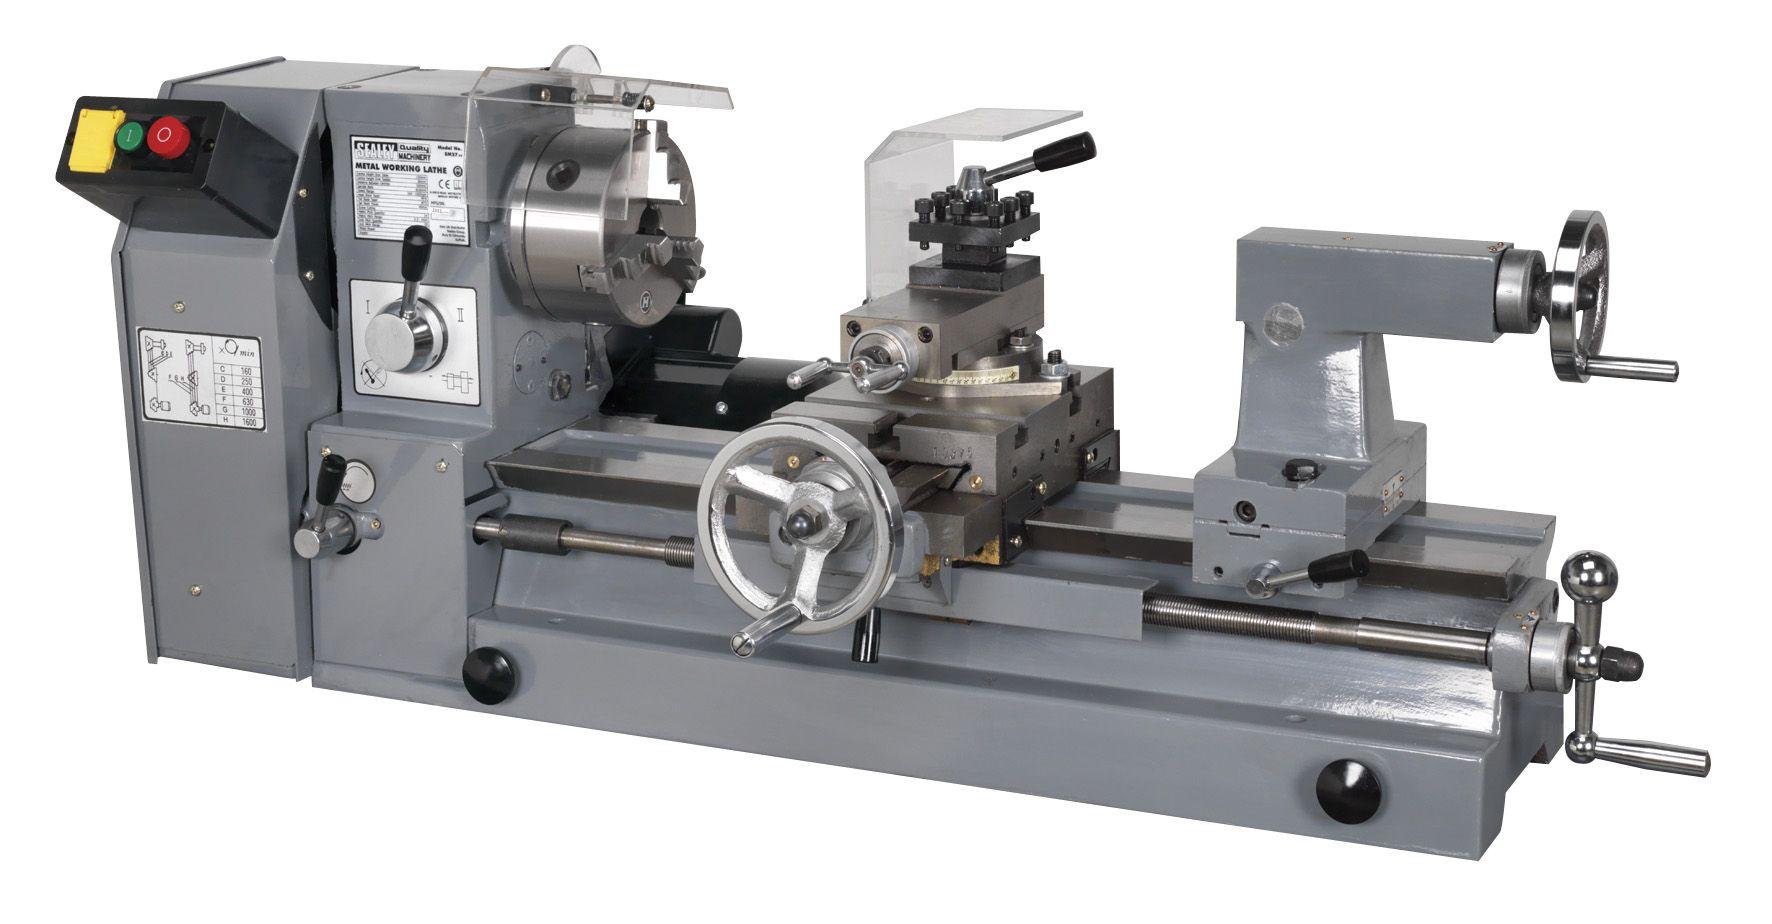 Sealey Metalworking Lathe 500mm Between Centres